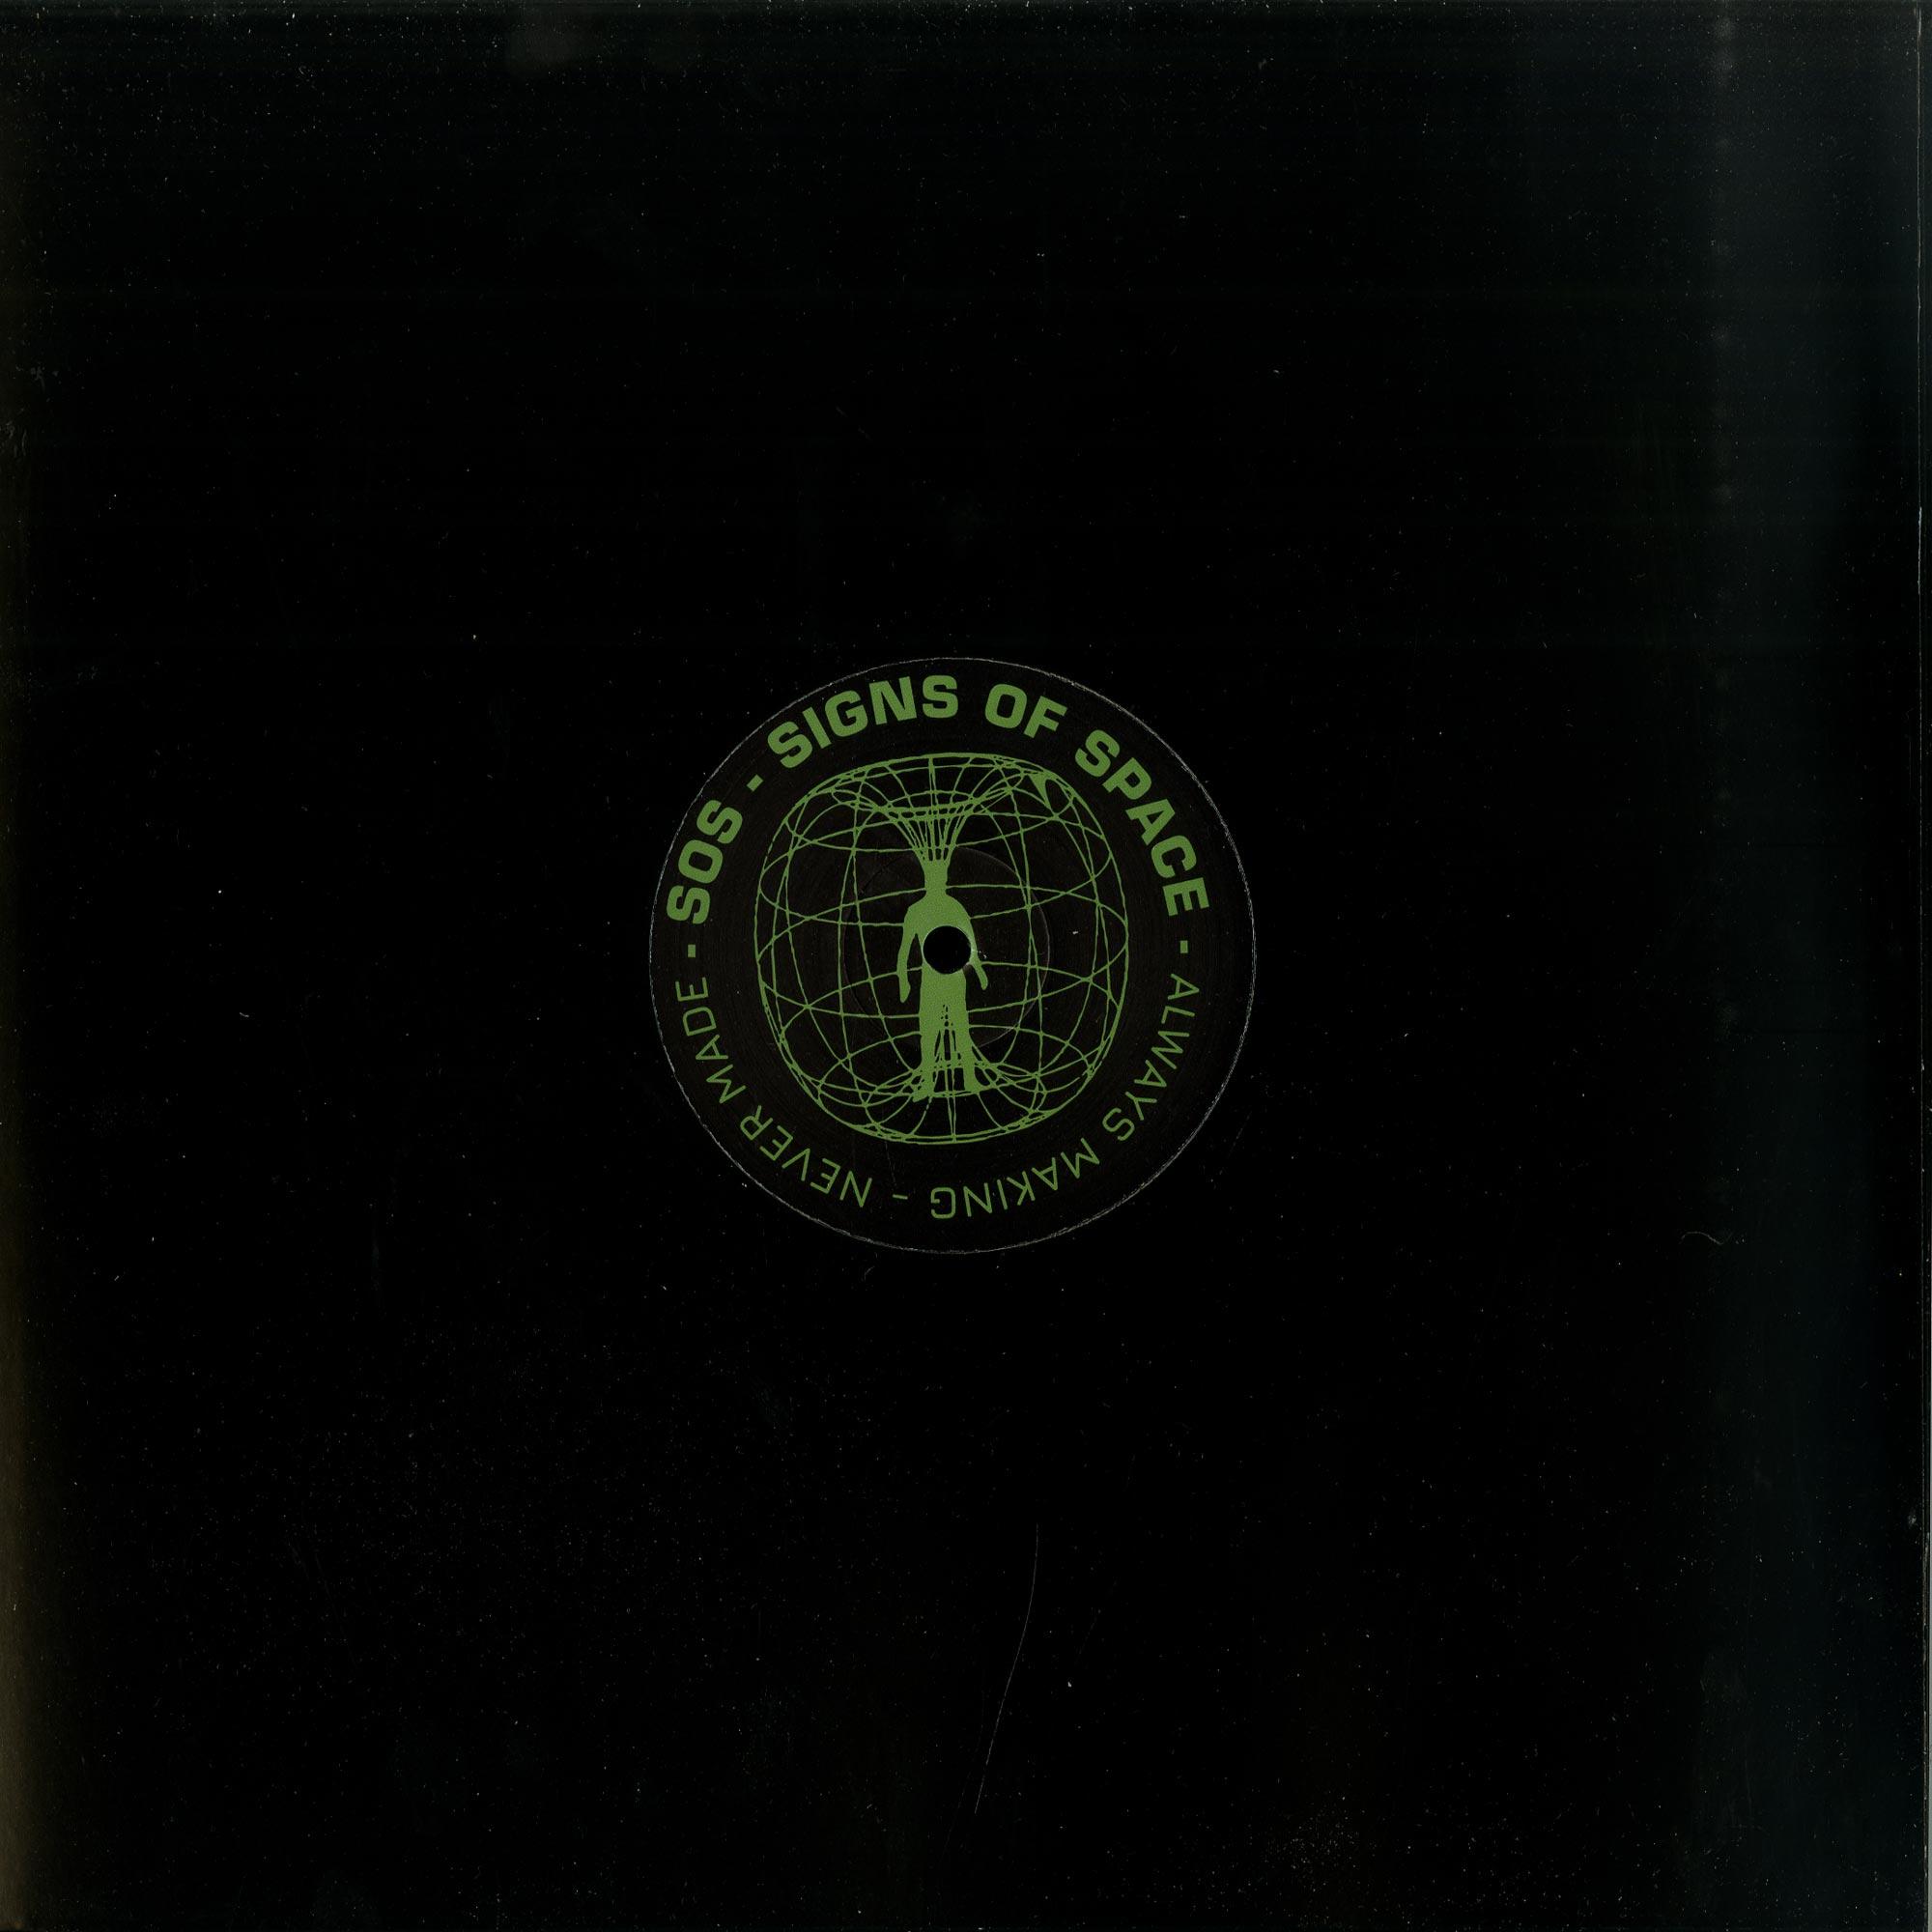 Long Island Sound - BROKEN SIGNALS